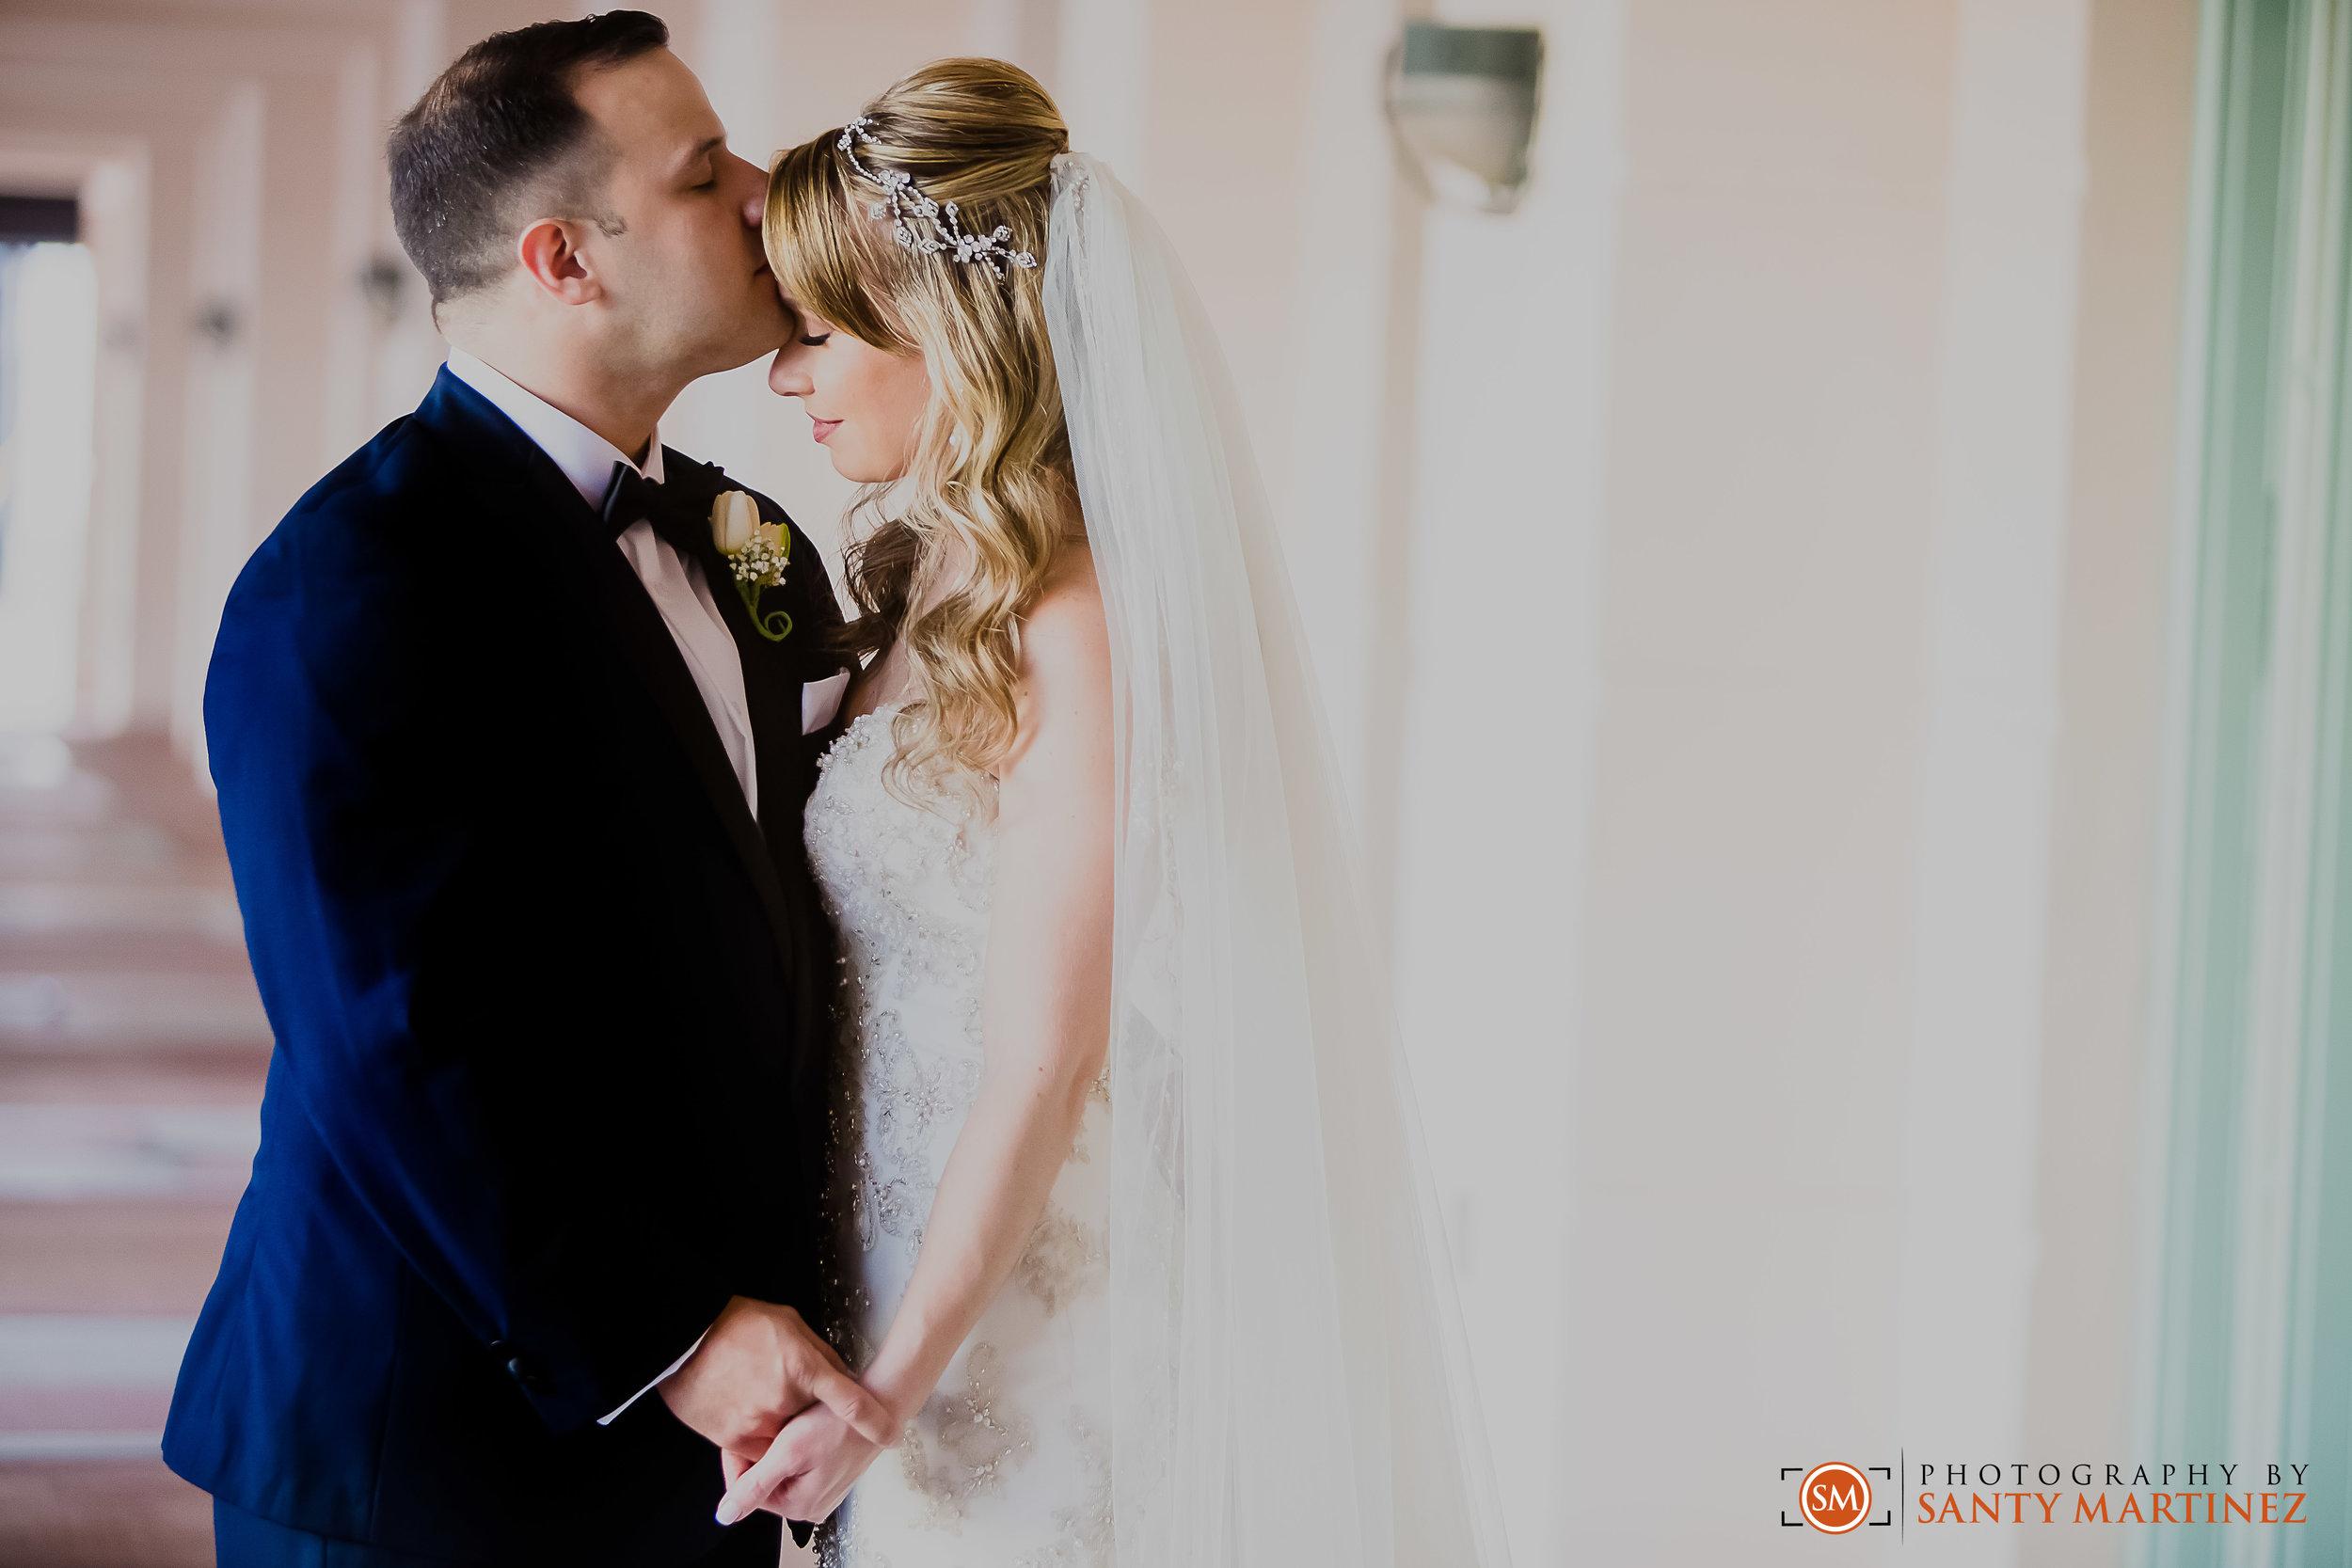 Wedding La Jolla Ballroom - Photography by Santy Martinez-19.jpg